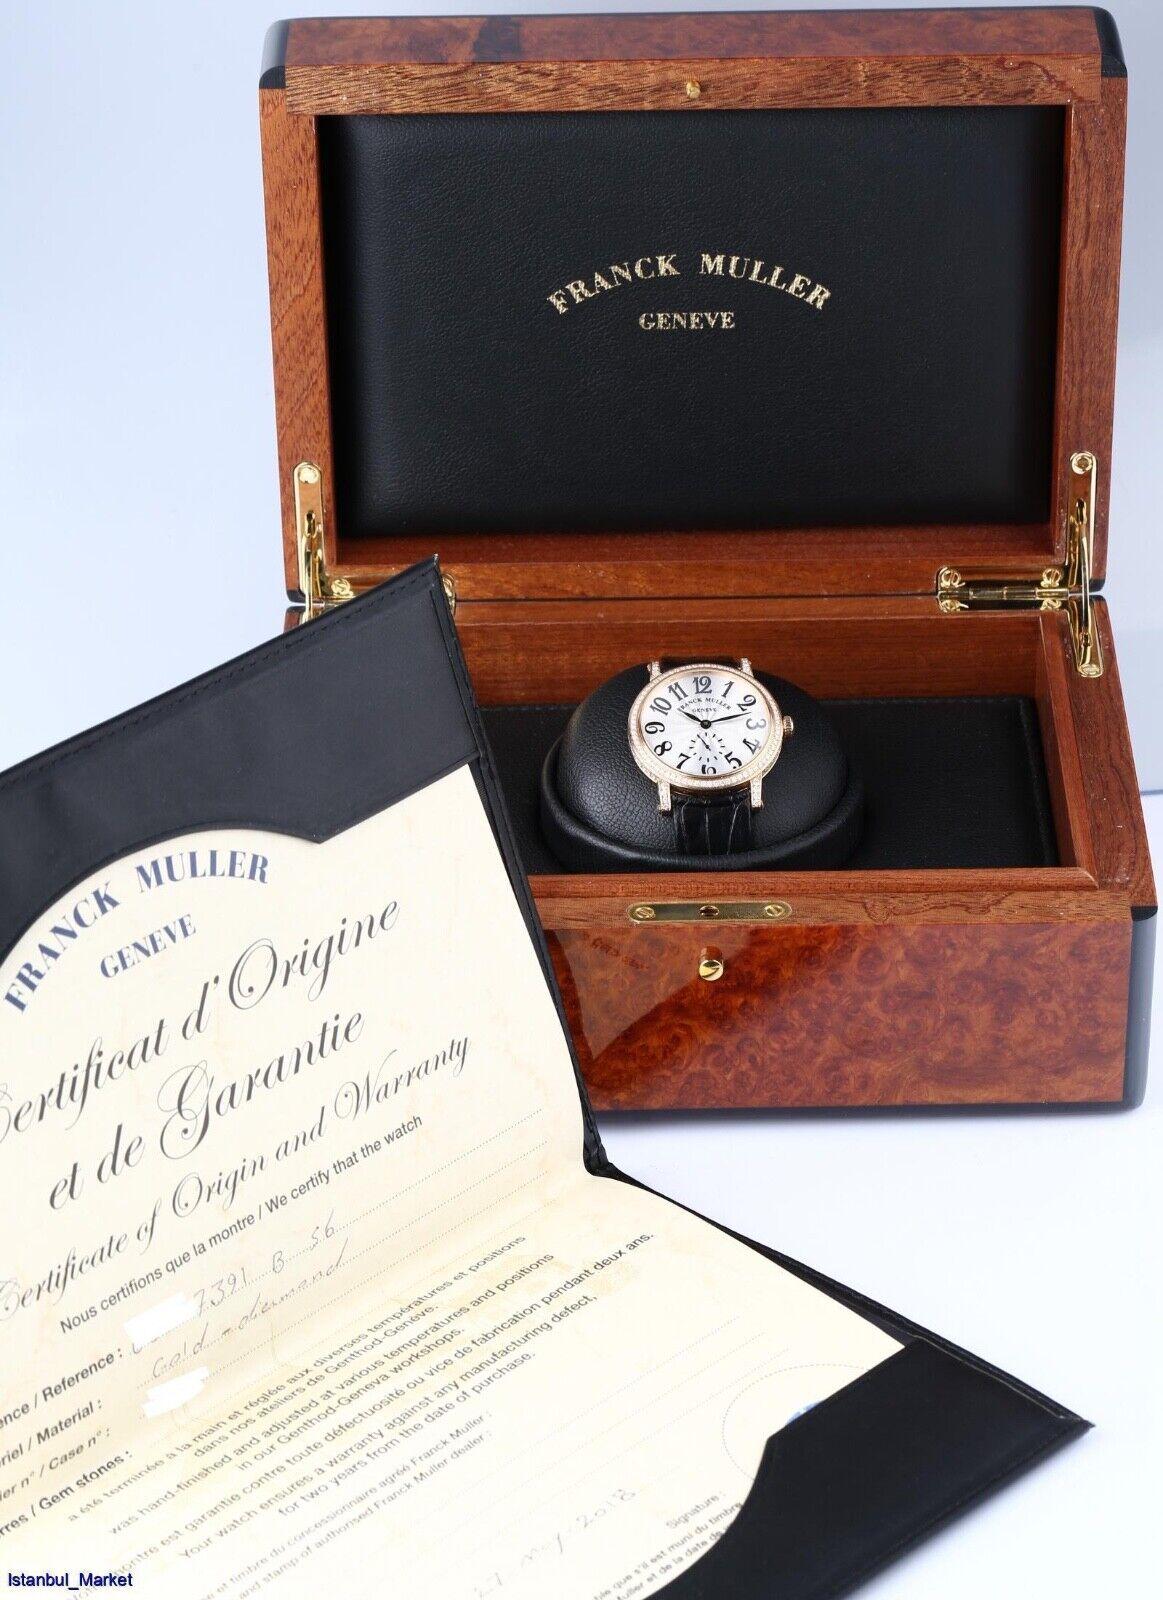 Franck Muller Diamond Dress Ref# 7391 B S6 D 18k Rose Gold & Diamonds - watch picture 1